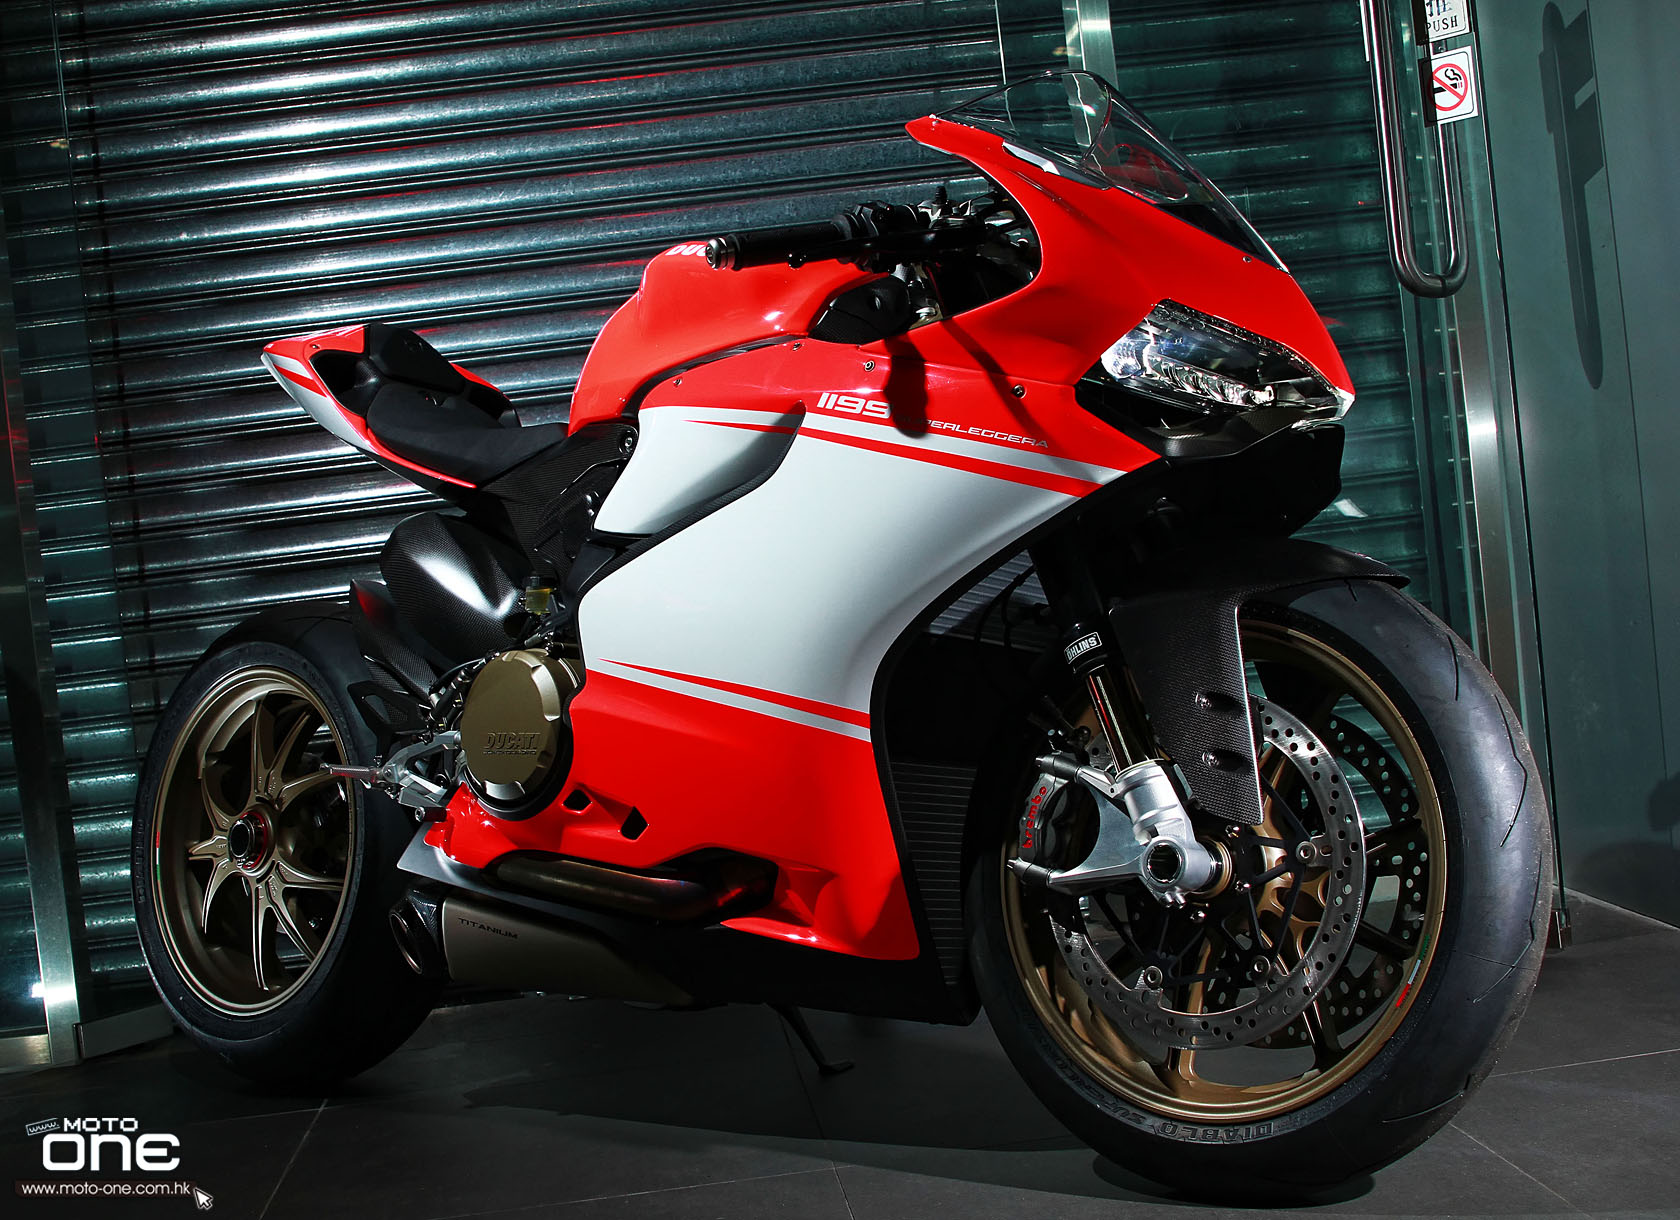 DUCATI 1199Supreleggera 2014 紅白 寄賣車 - 「Webike摩托車市」